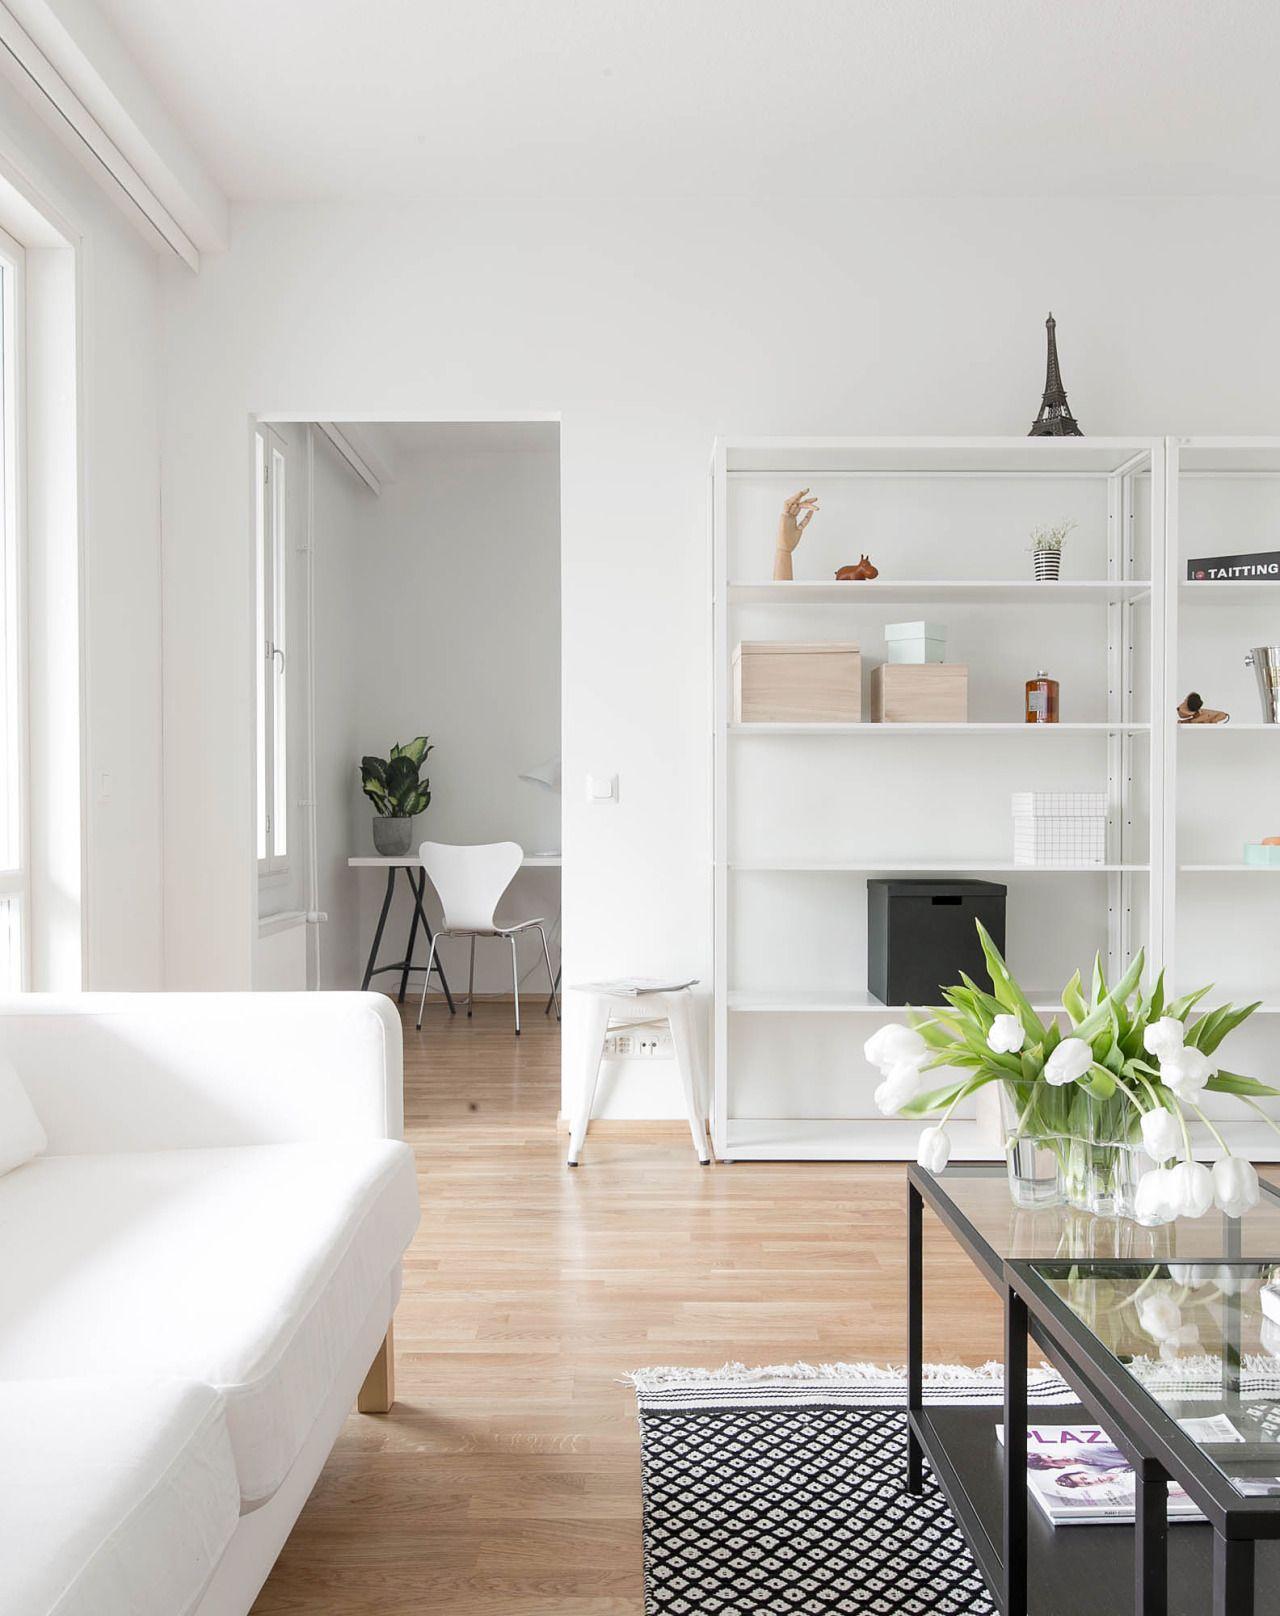 Ikea 'Fjälkinge' shelves   Apartment inspiration, Ikea ...